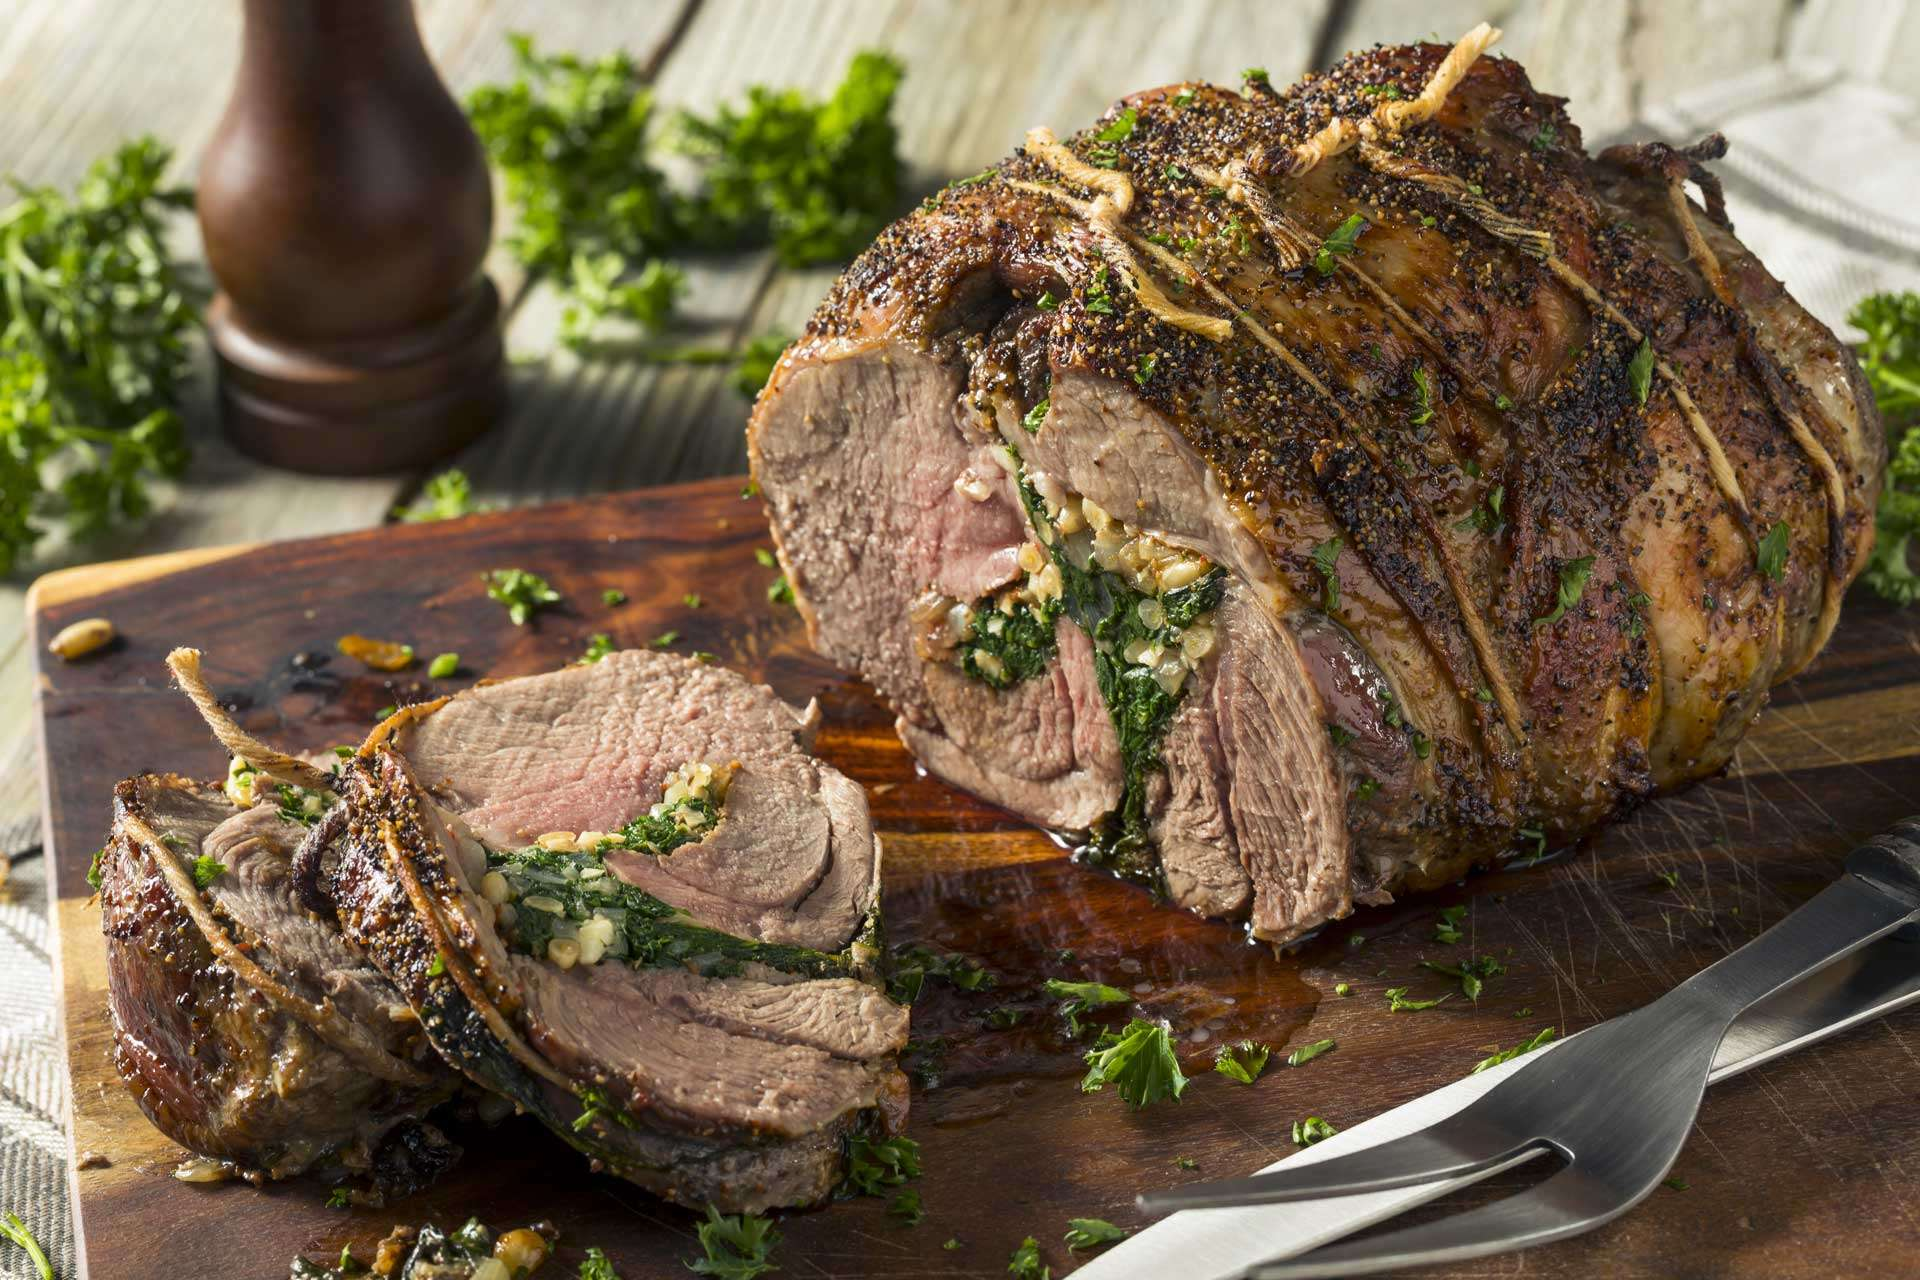 Pot-roasted Stuffed Lamb of Leg